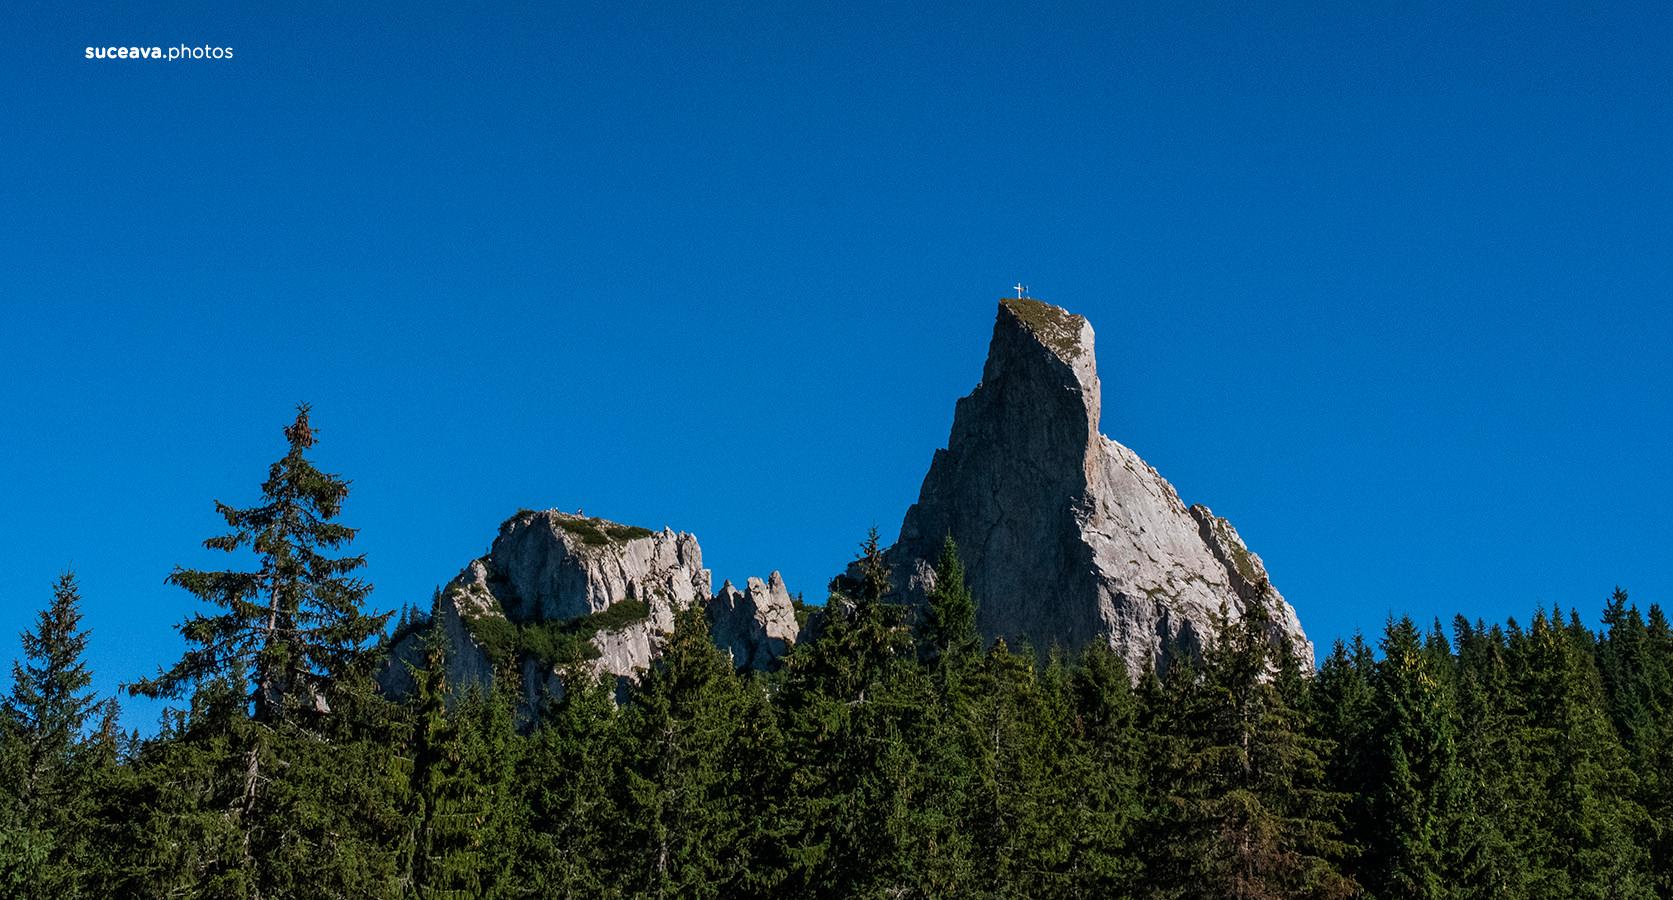 Trasee de drumeție din Munții Rarău